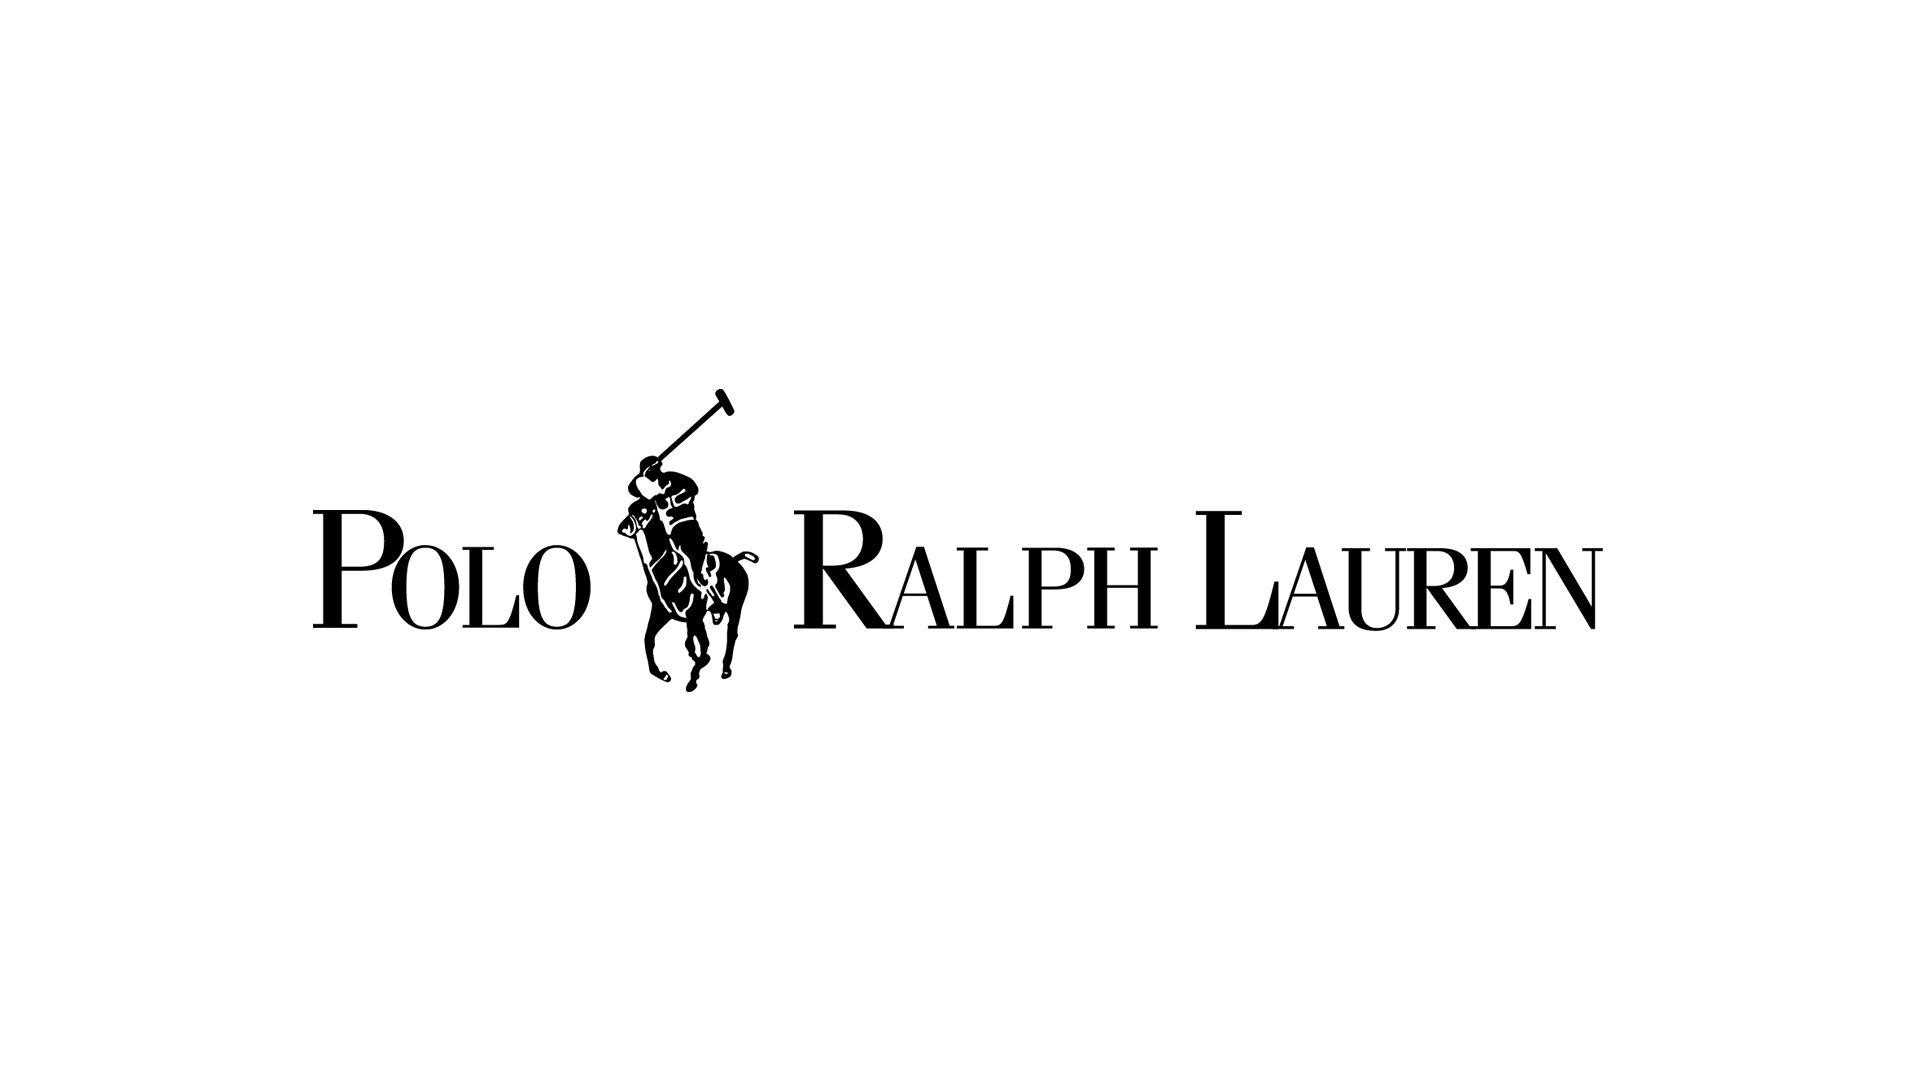 Ralph Lauren Wallpaper2 Wallpapers Wallpaper Hd Background